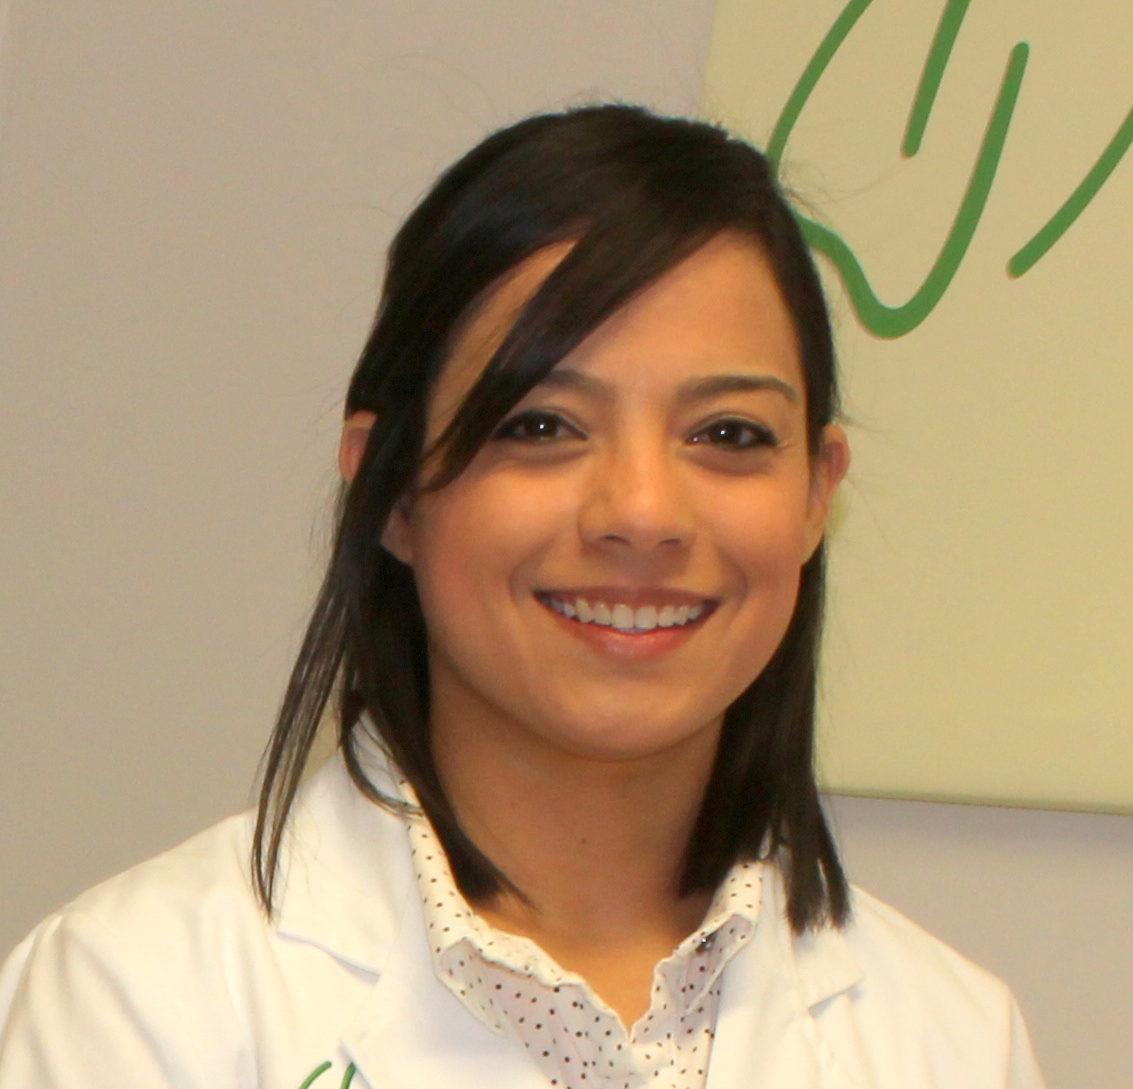 Dra. Mayra Marín